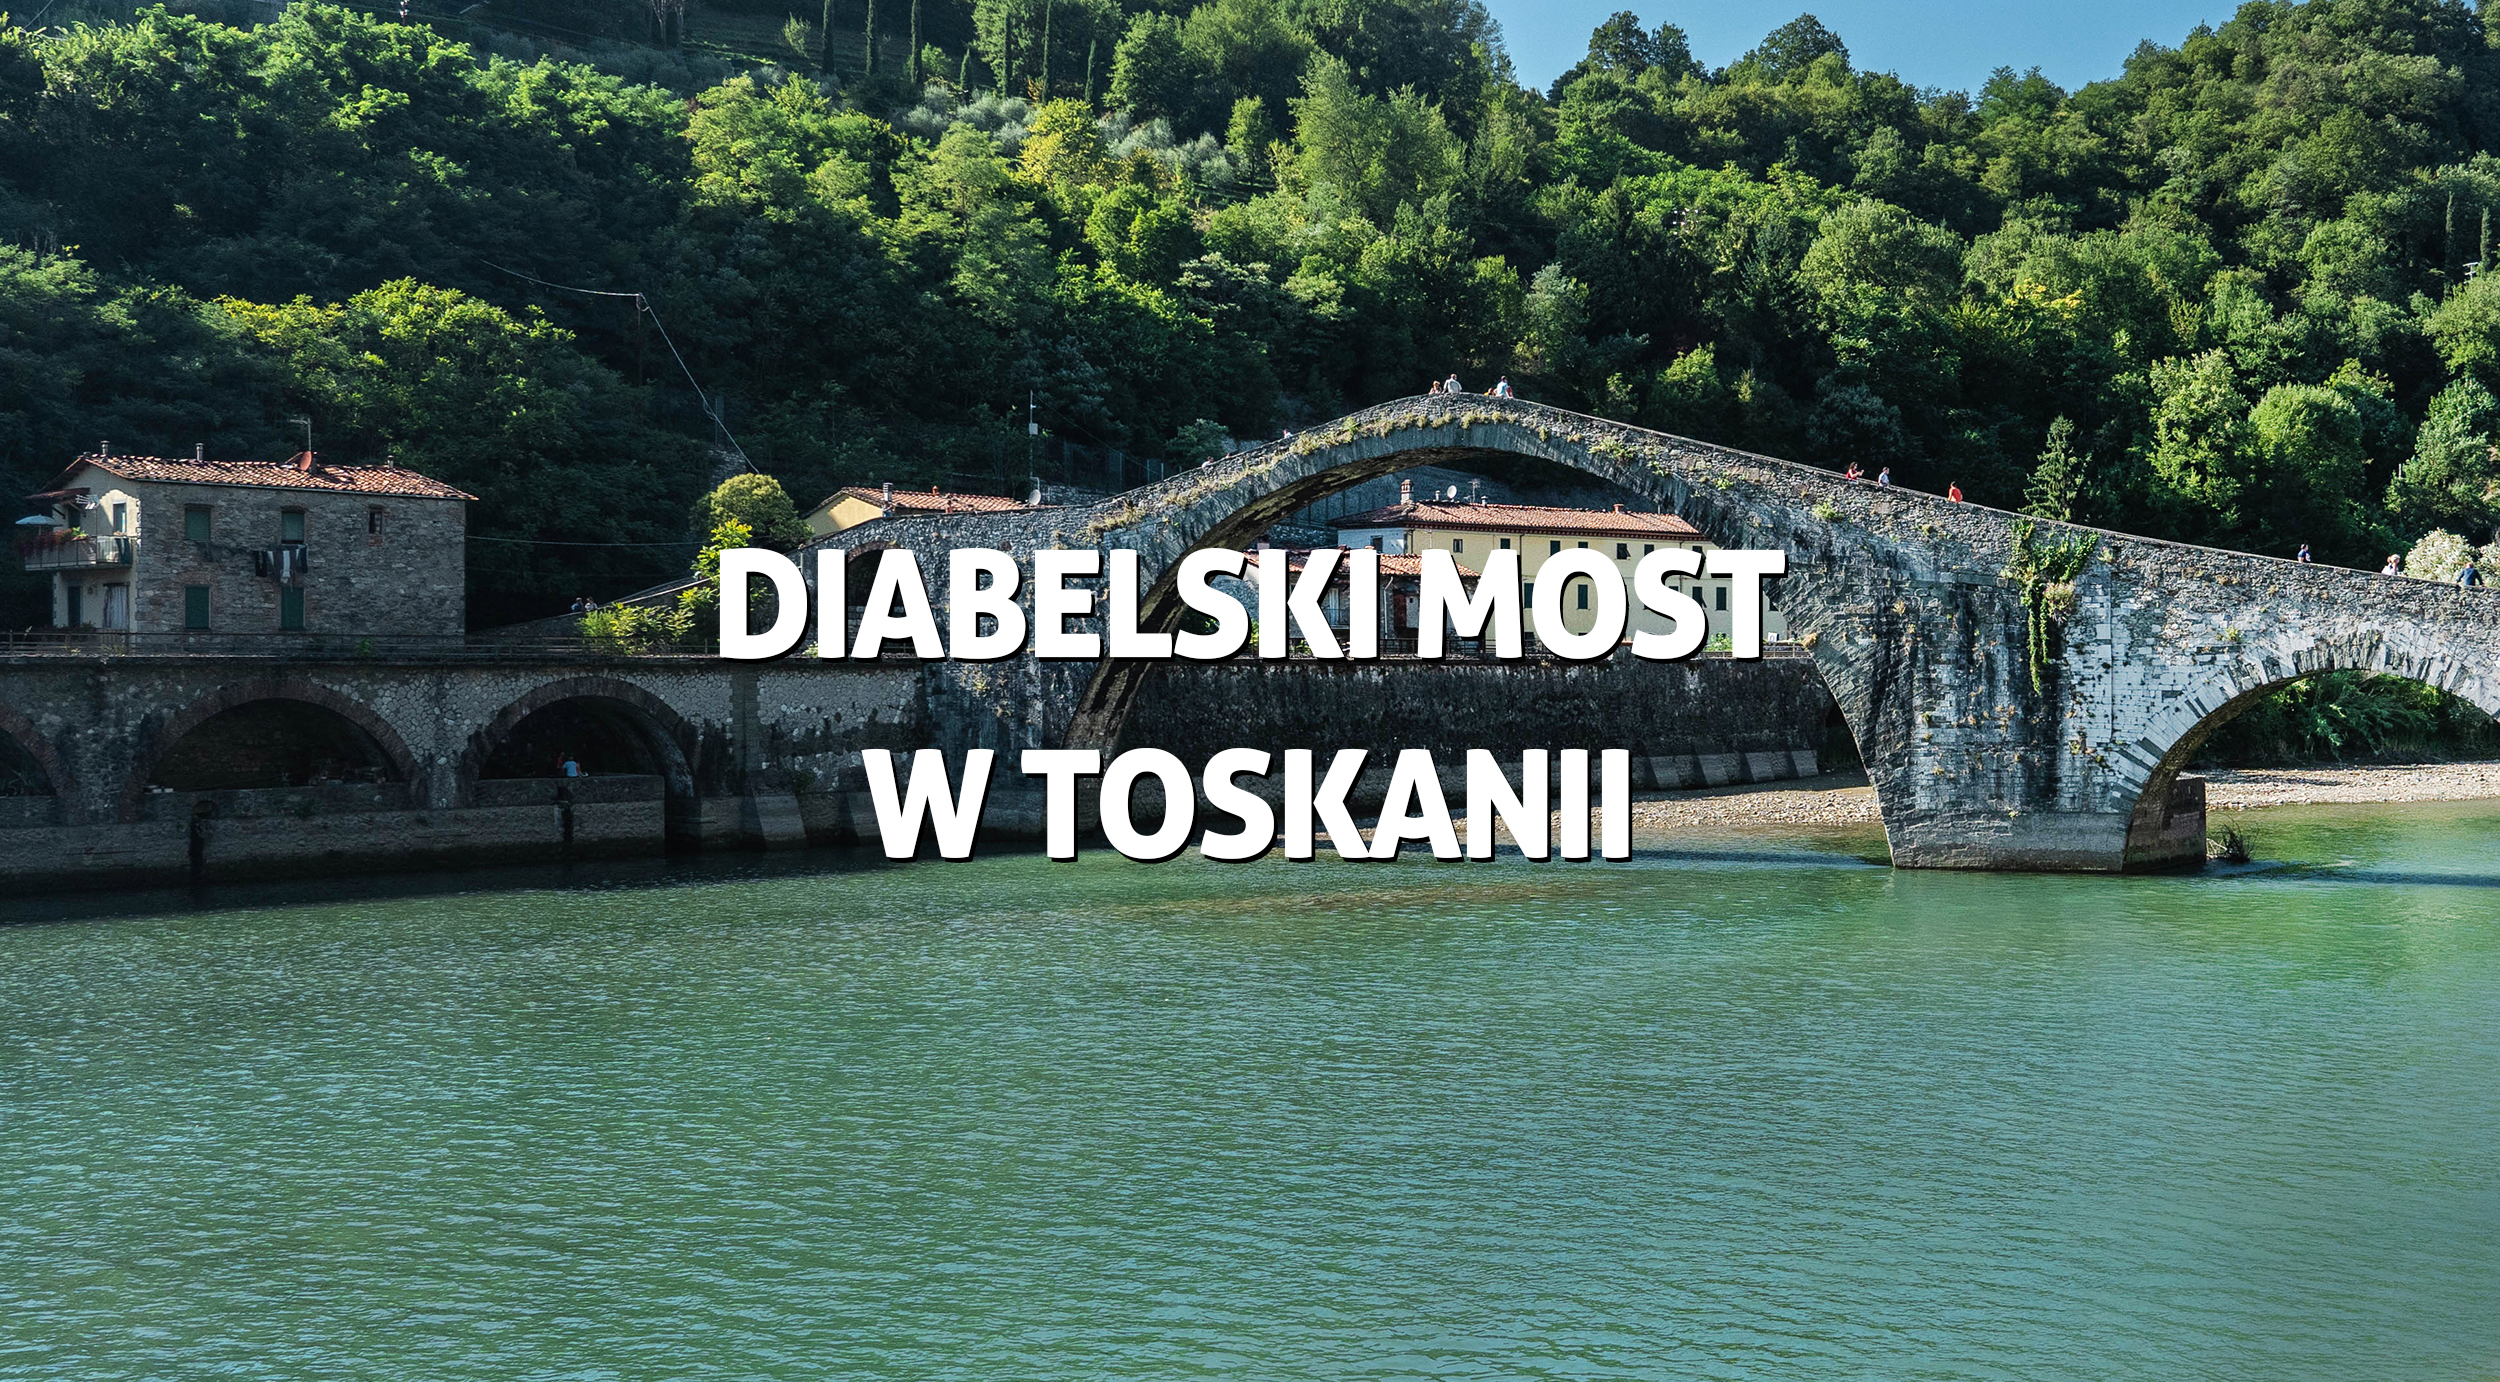 Diabelski most wToskanii - Ponte del diavolo